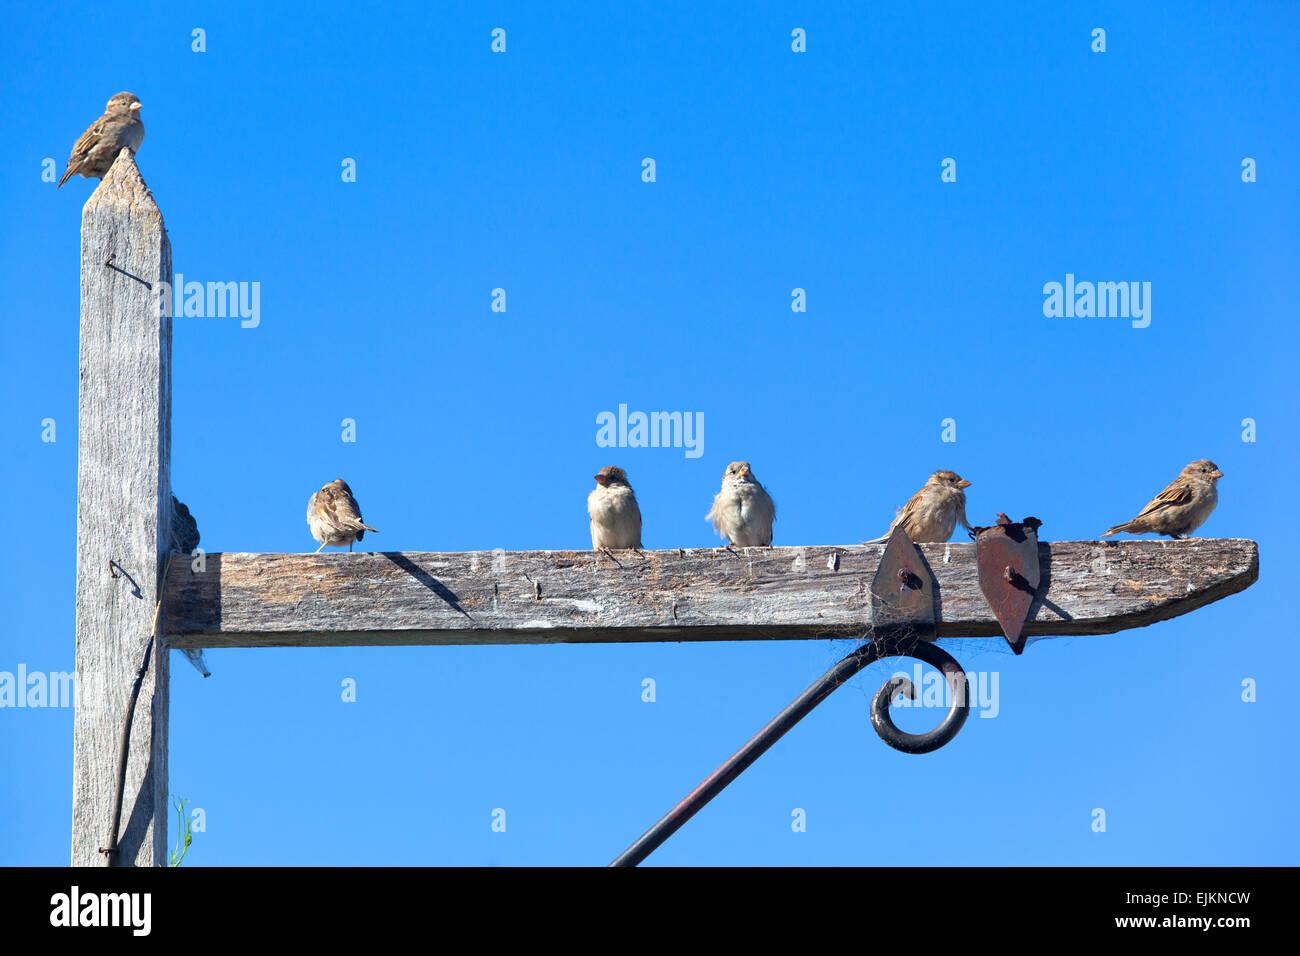 Row of birds on a wooden pole. Historical neighborhood of Colonia del Sacramento, Uruguay. - Stock Image